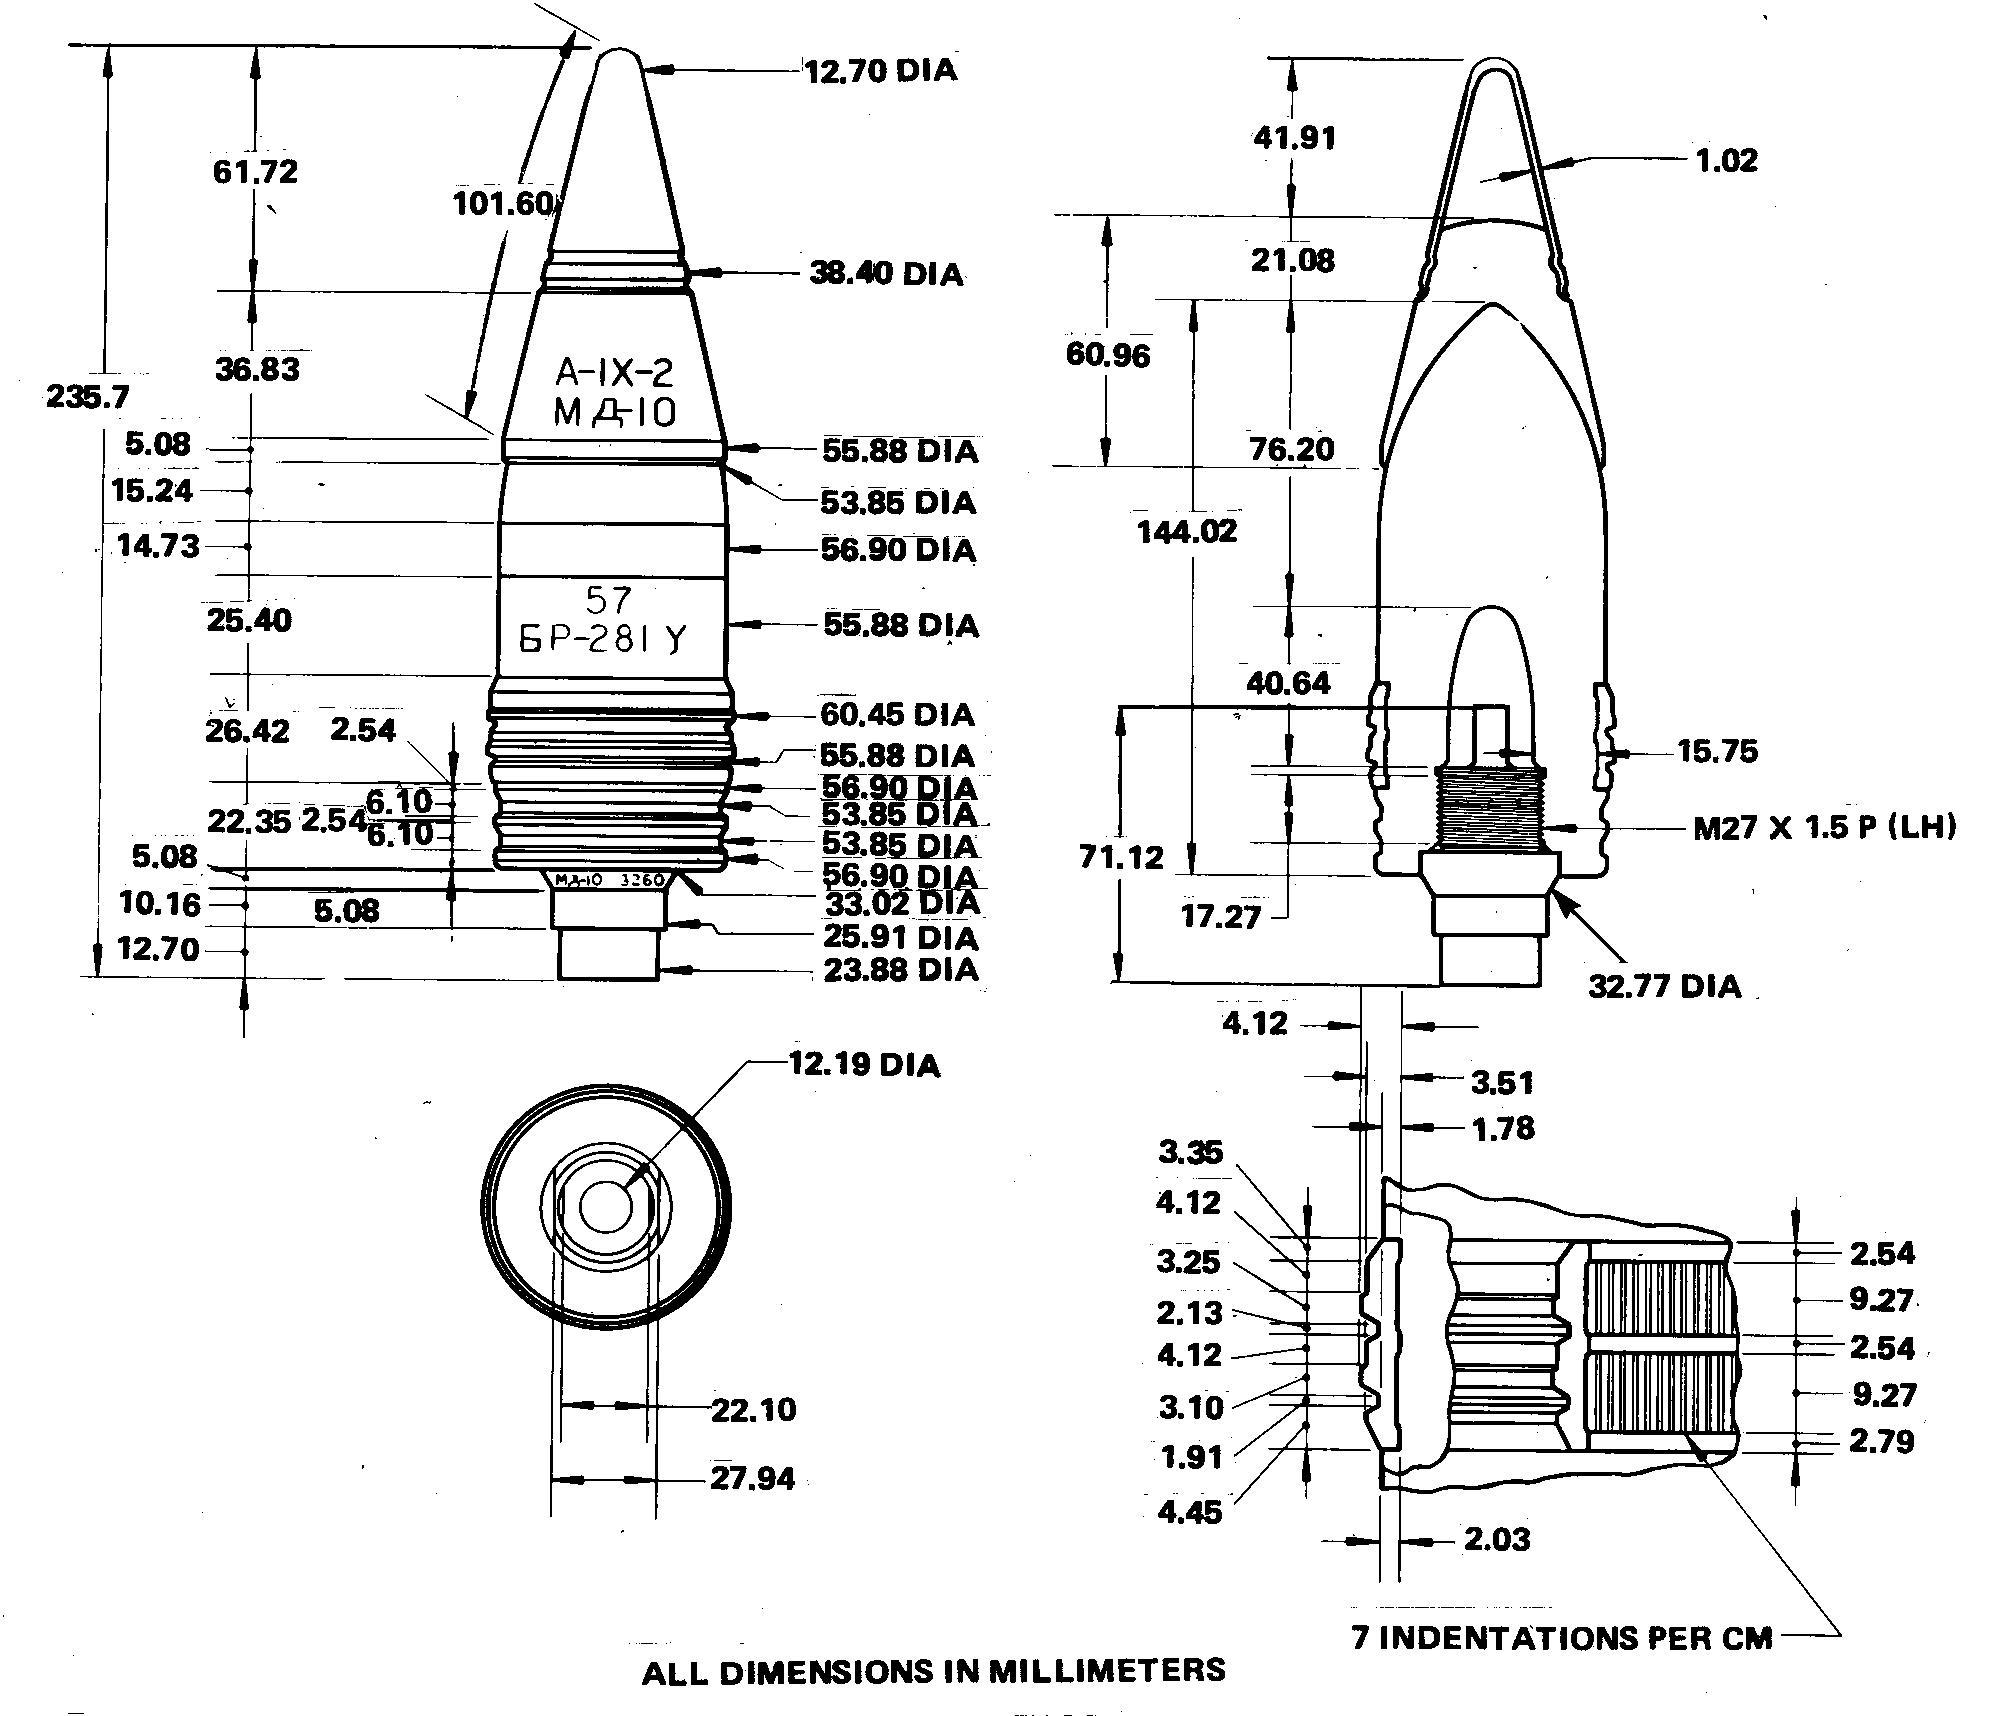 Zsu S M19